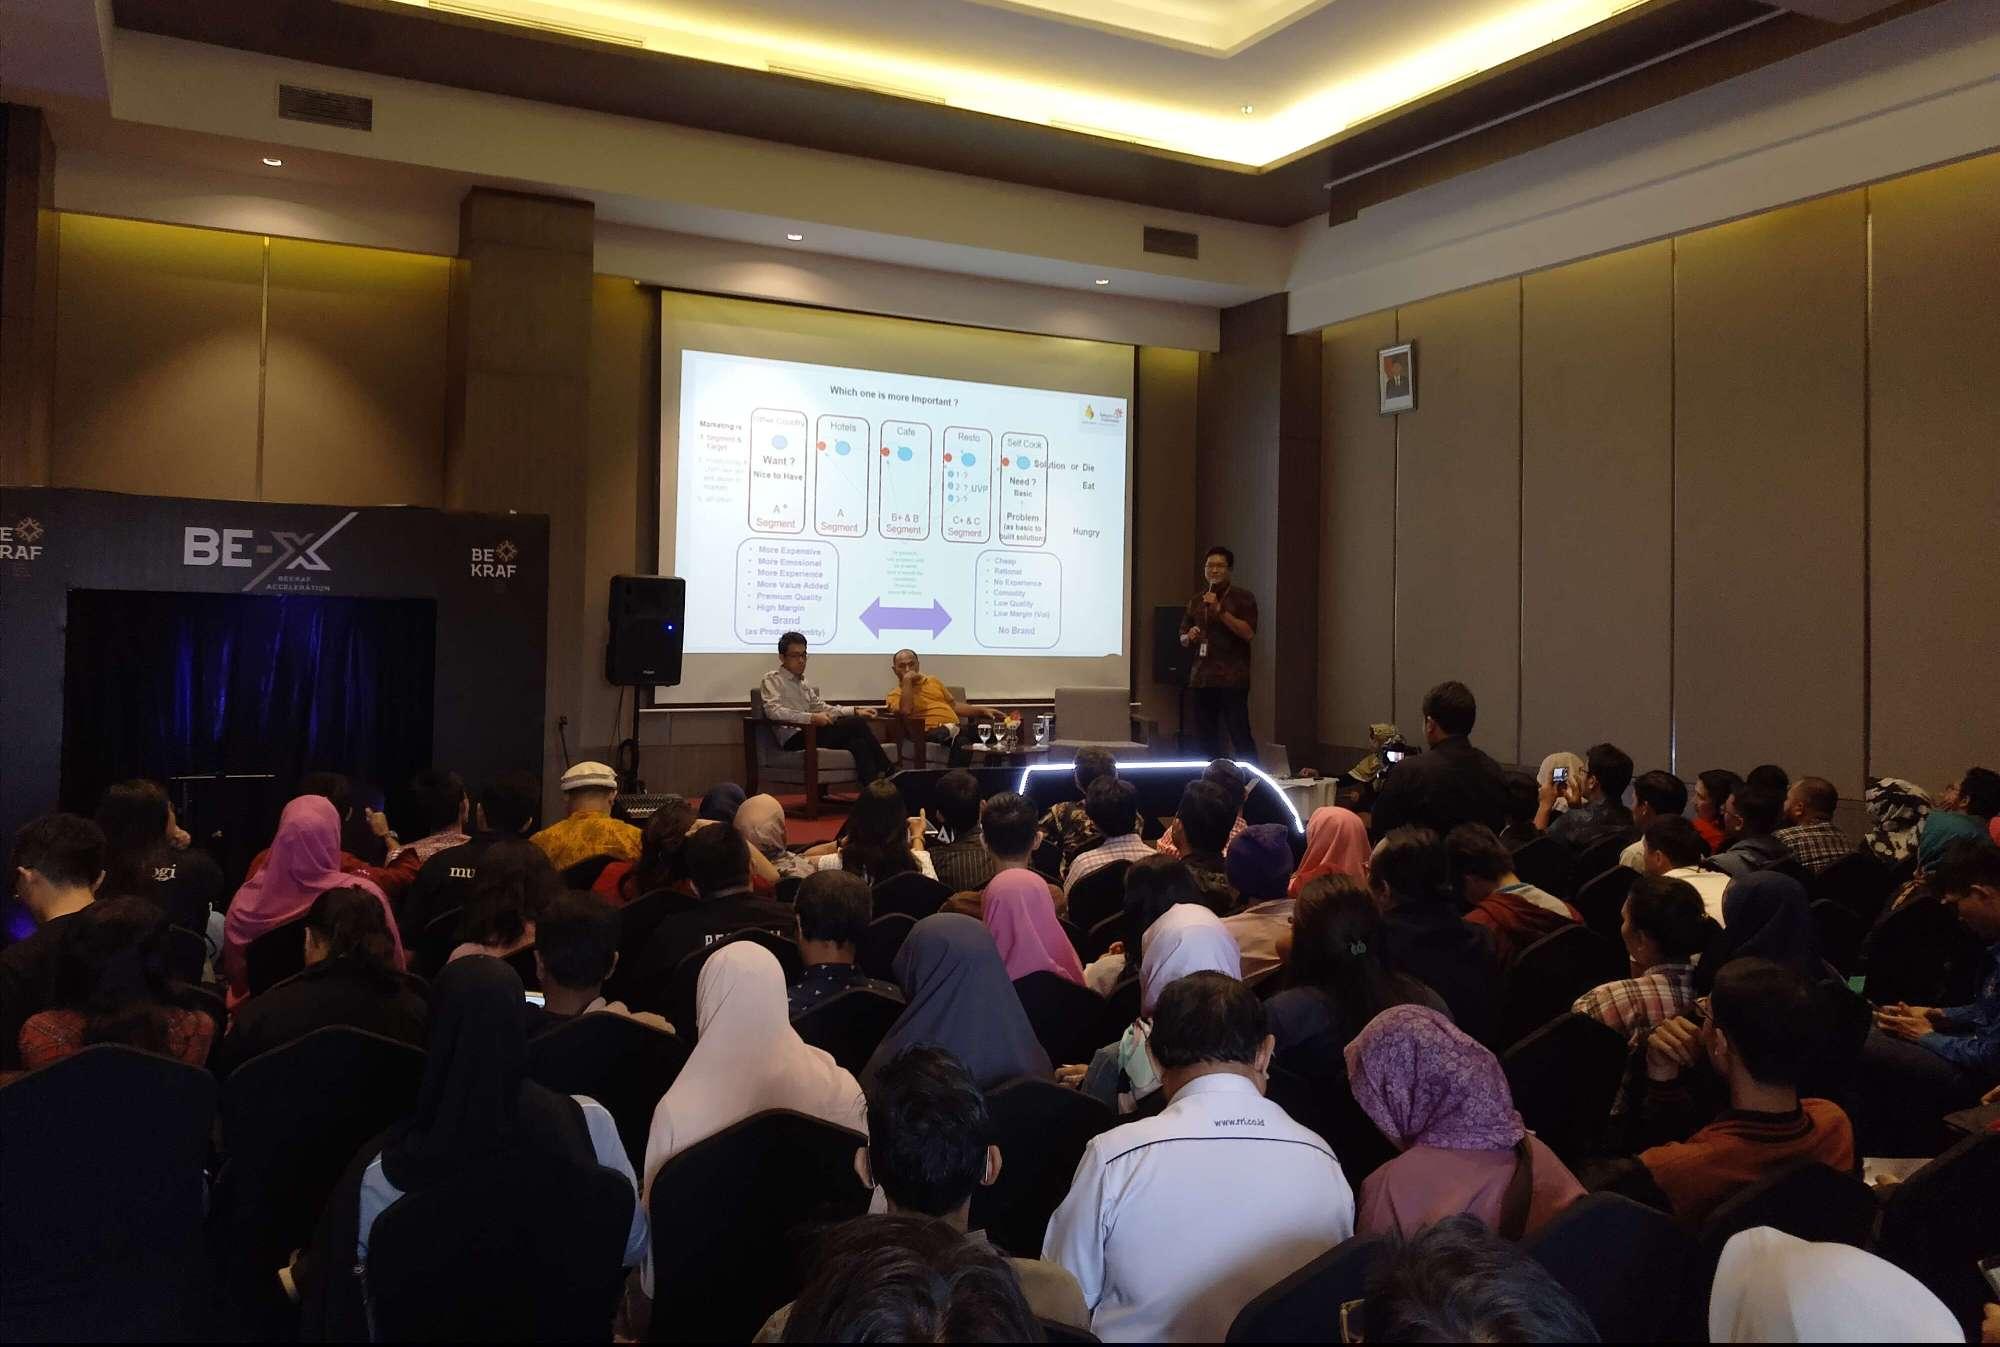 Bekraf Dorong Pertumbuhan Ekosistem Start-Up Indonesia Melalui BE-X